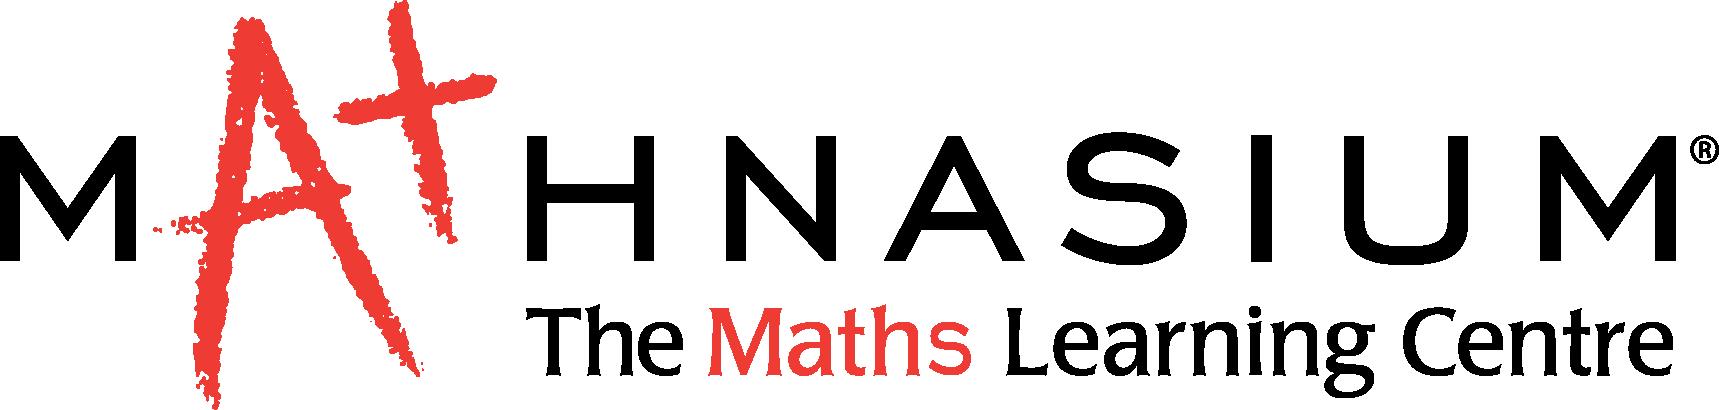 Numerical Fluency Limited